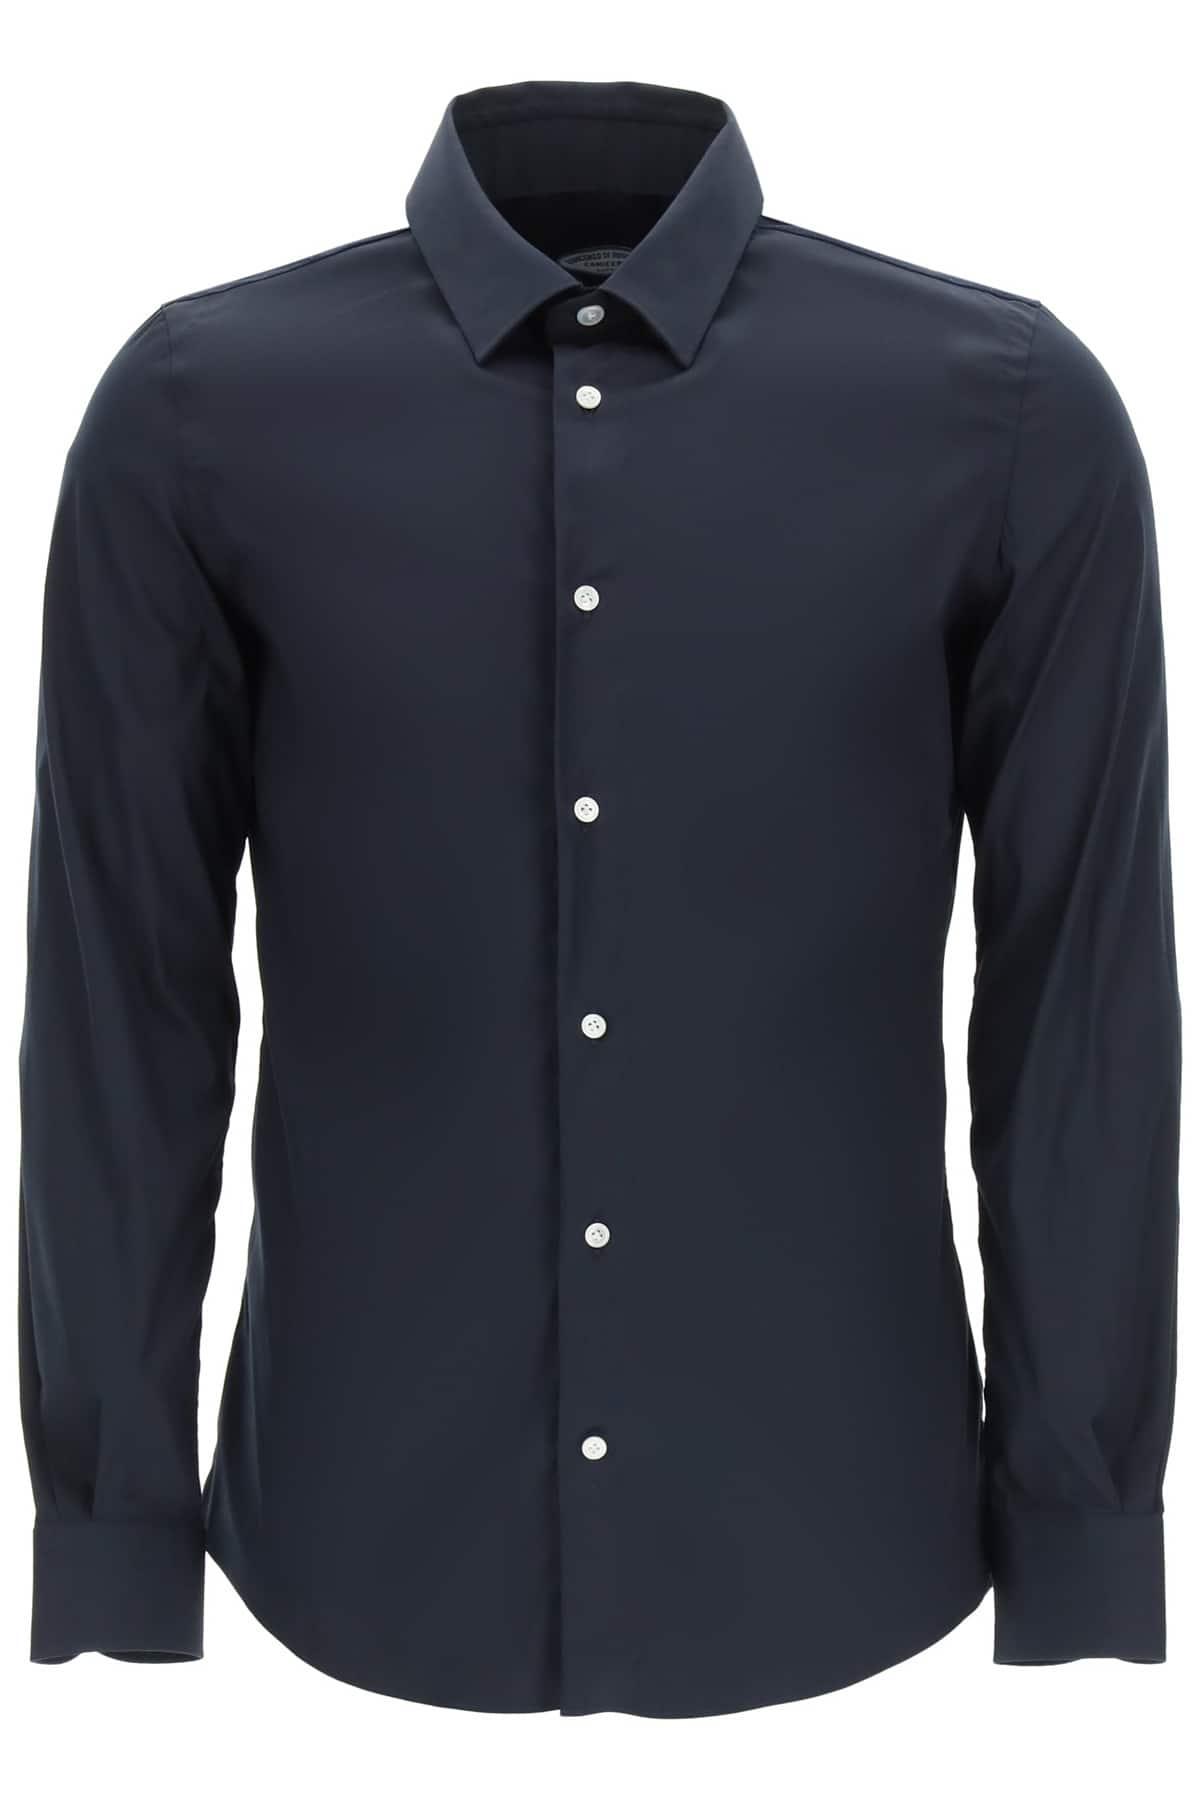 VINCENZO DI RUGGIERO CLASSIC TAILORED SHIRT 38 Blue Cotton